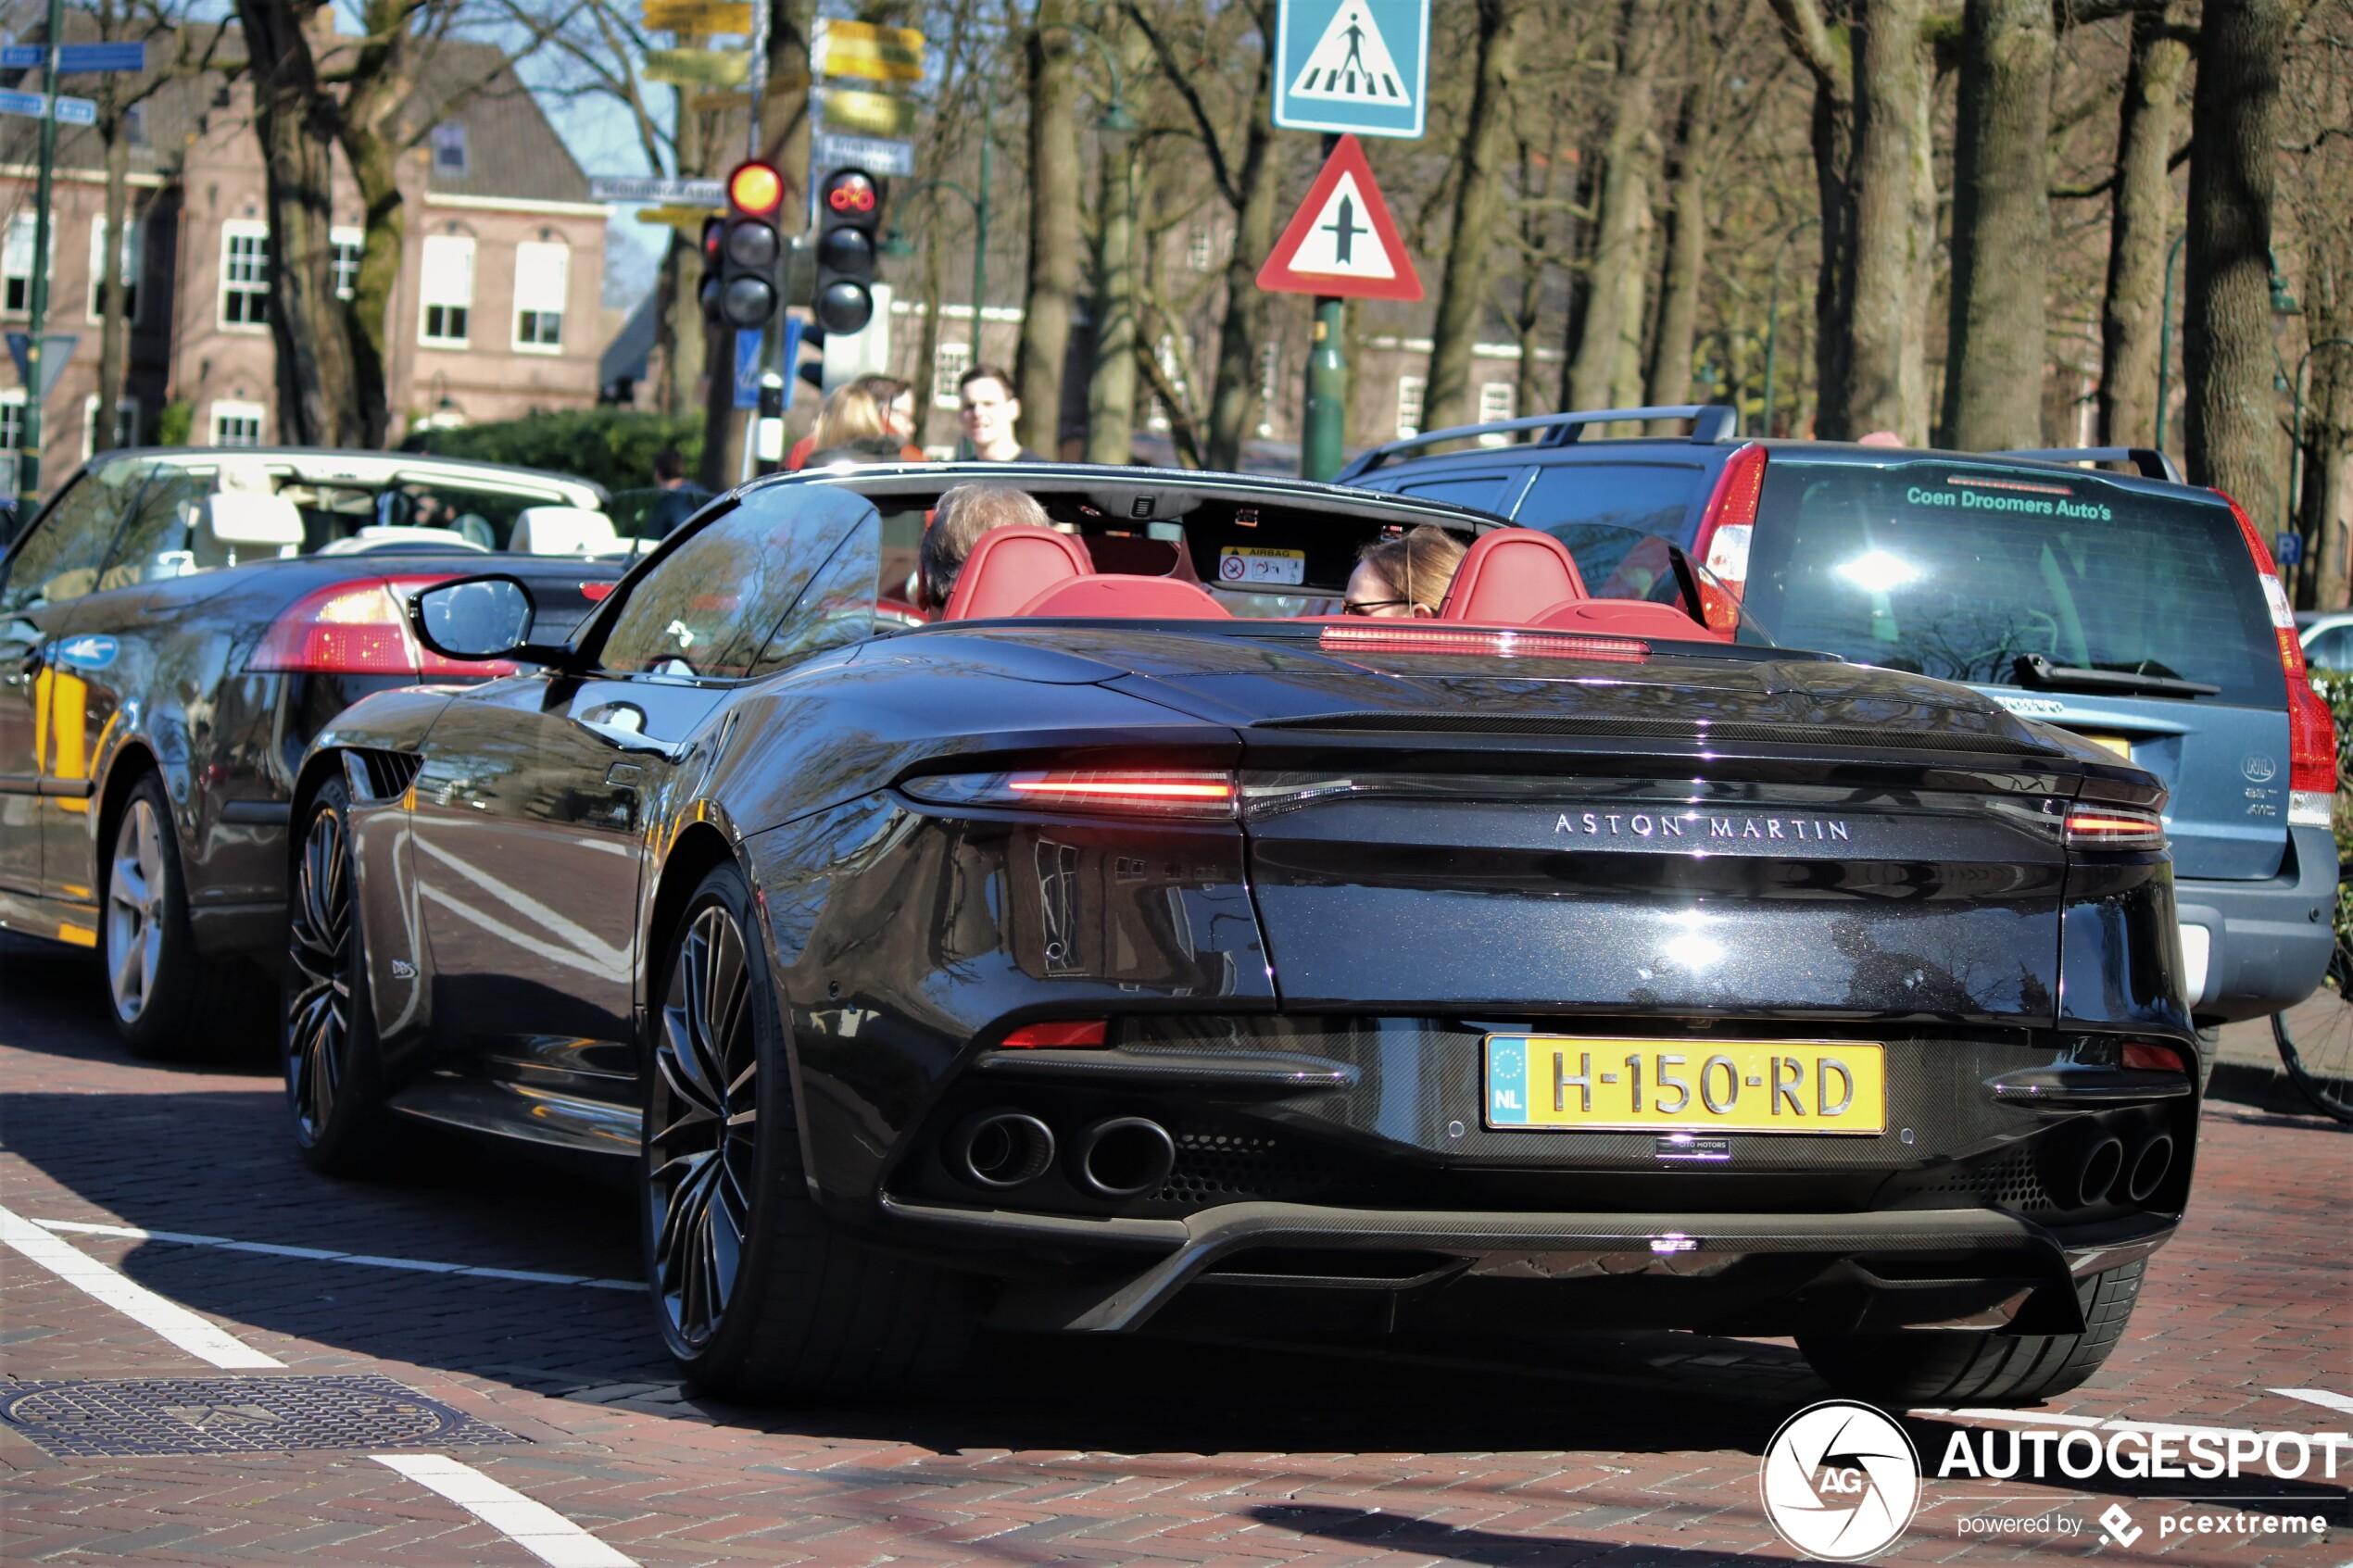 Gespot in Laren: Aston Martin DBS Superleggera Volante